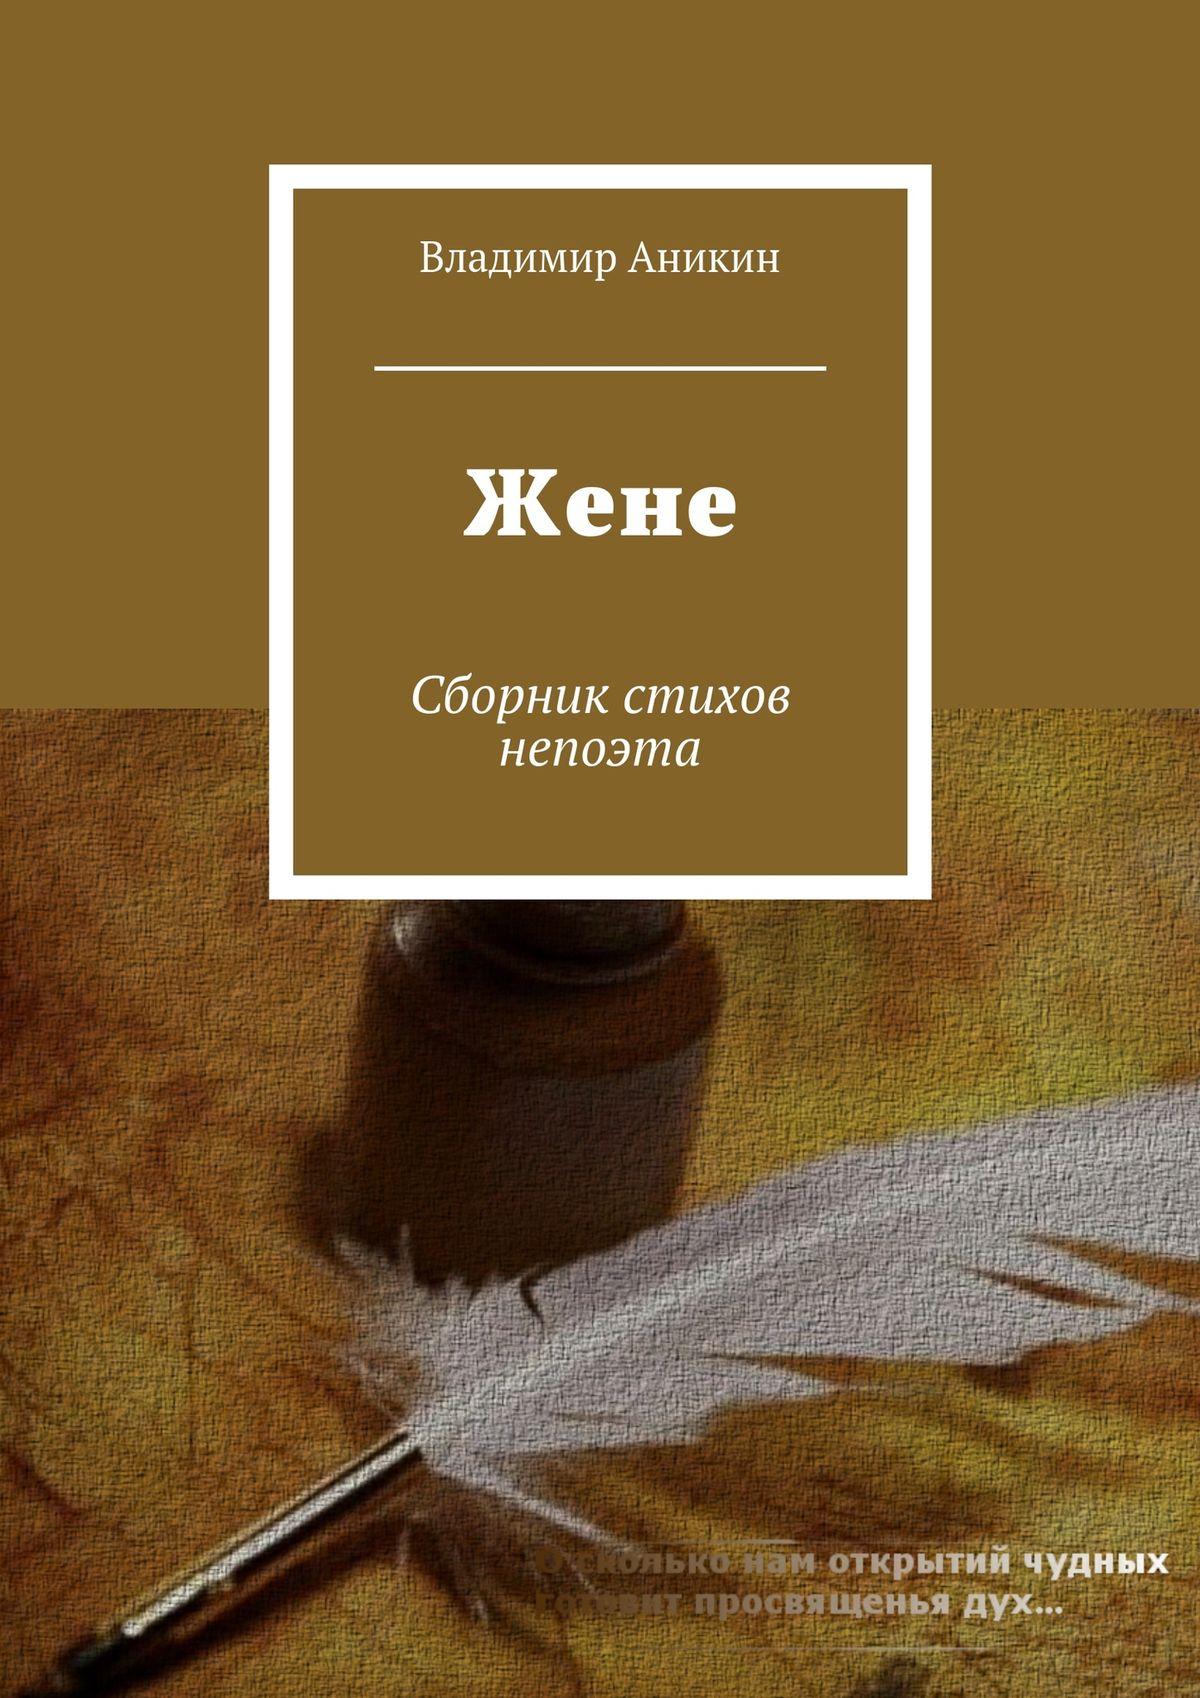 Владимир Аникин Жене. Сборник стихов непоэта